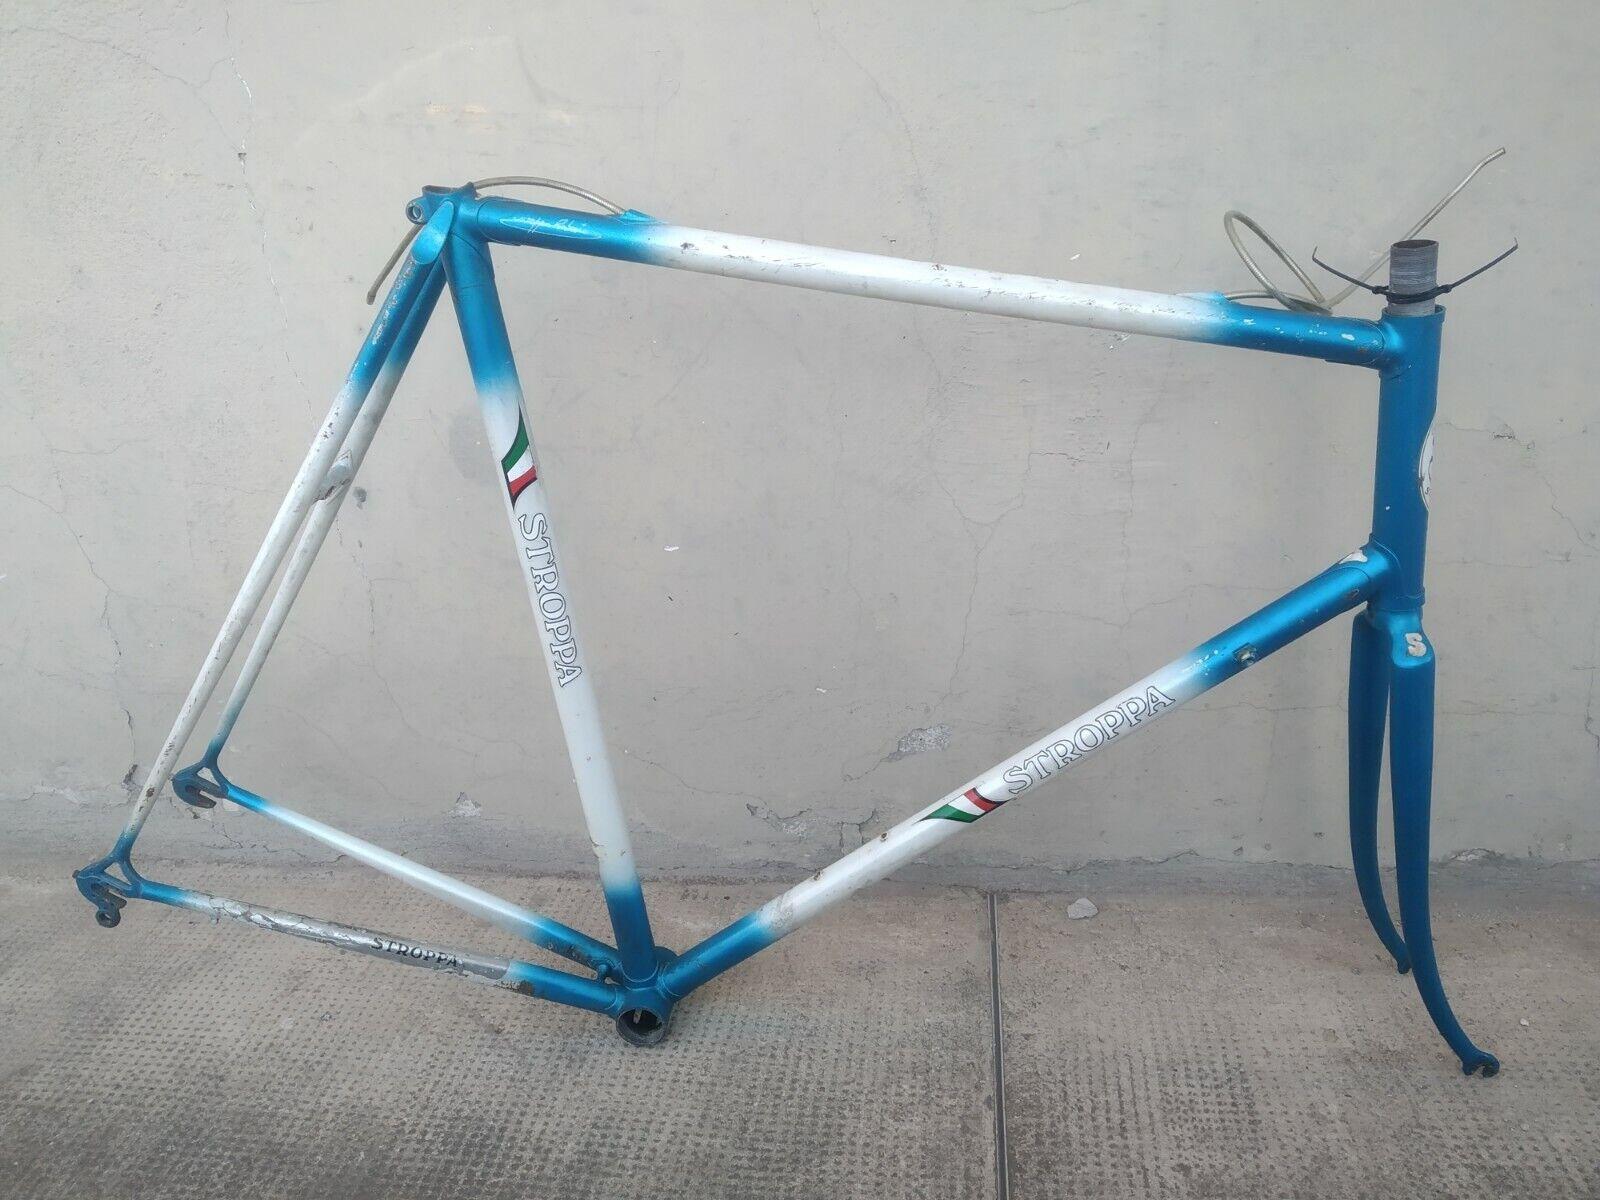 Vintage telaio frame corsa road Sannino  Stroppa 59 x 63 Gios Professional clone